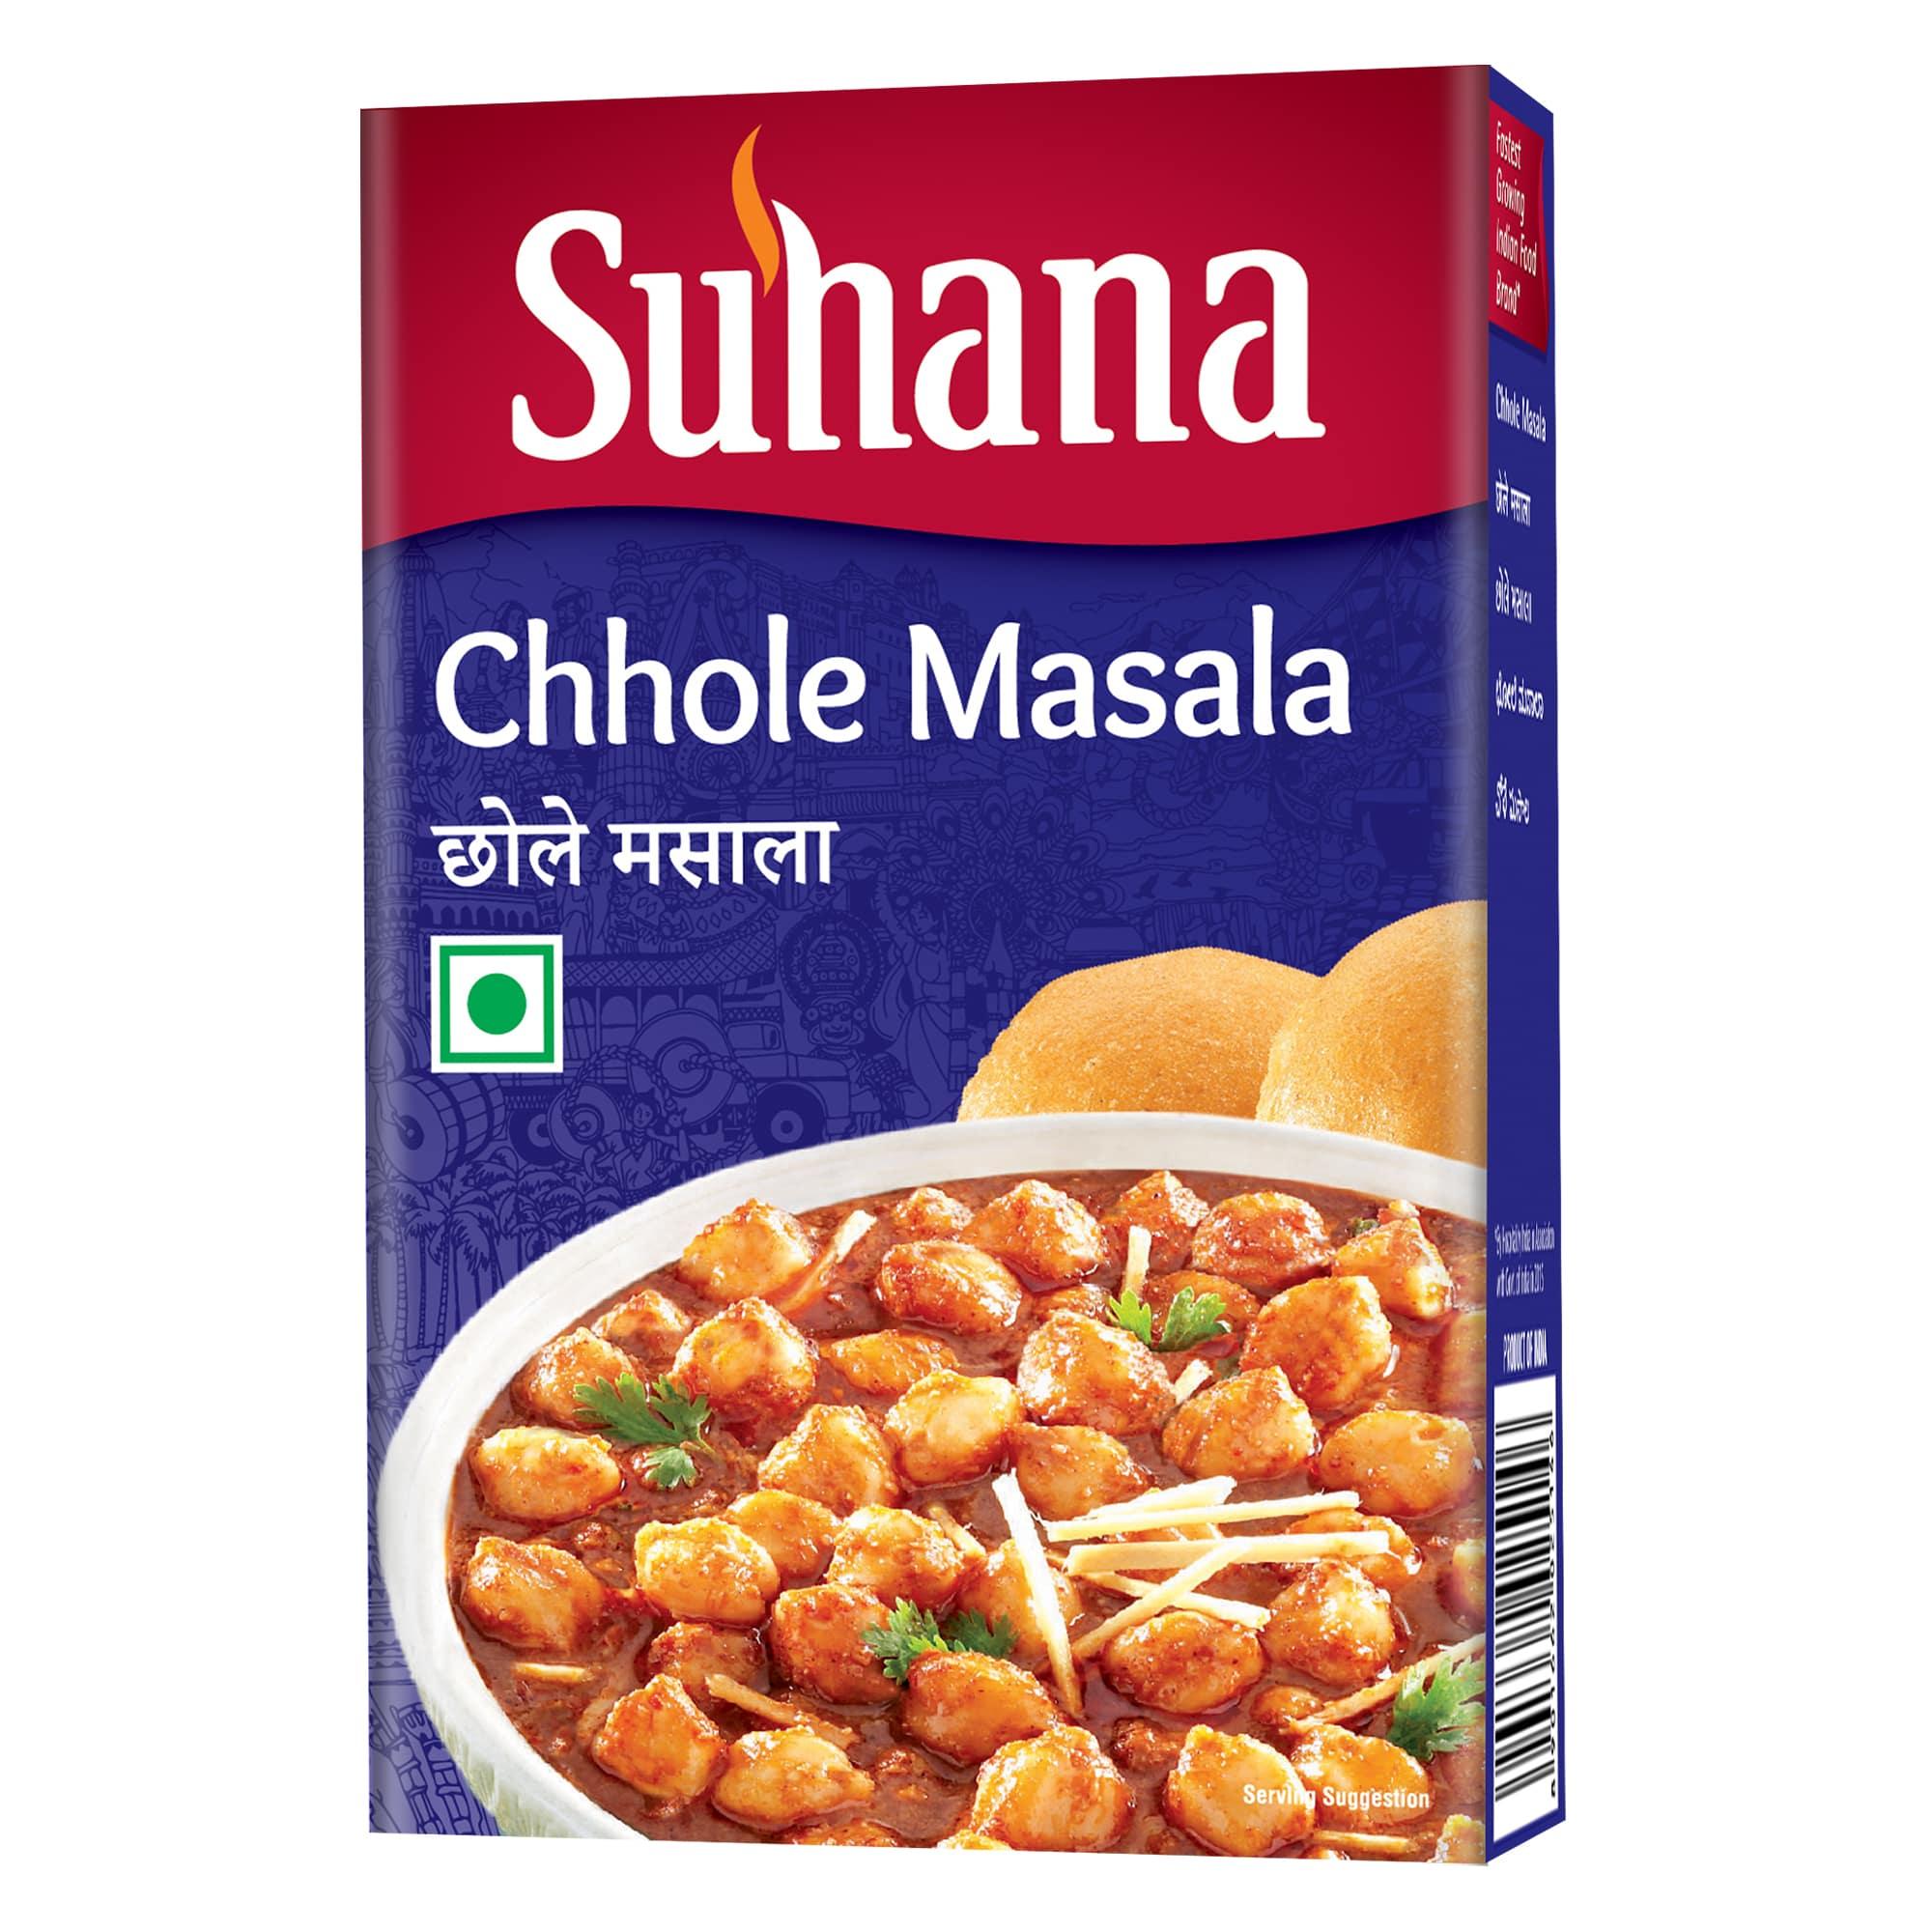 Suhana Chhole Masala Box